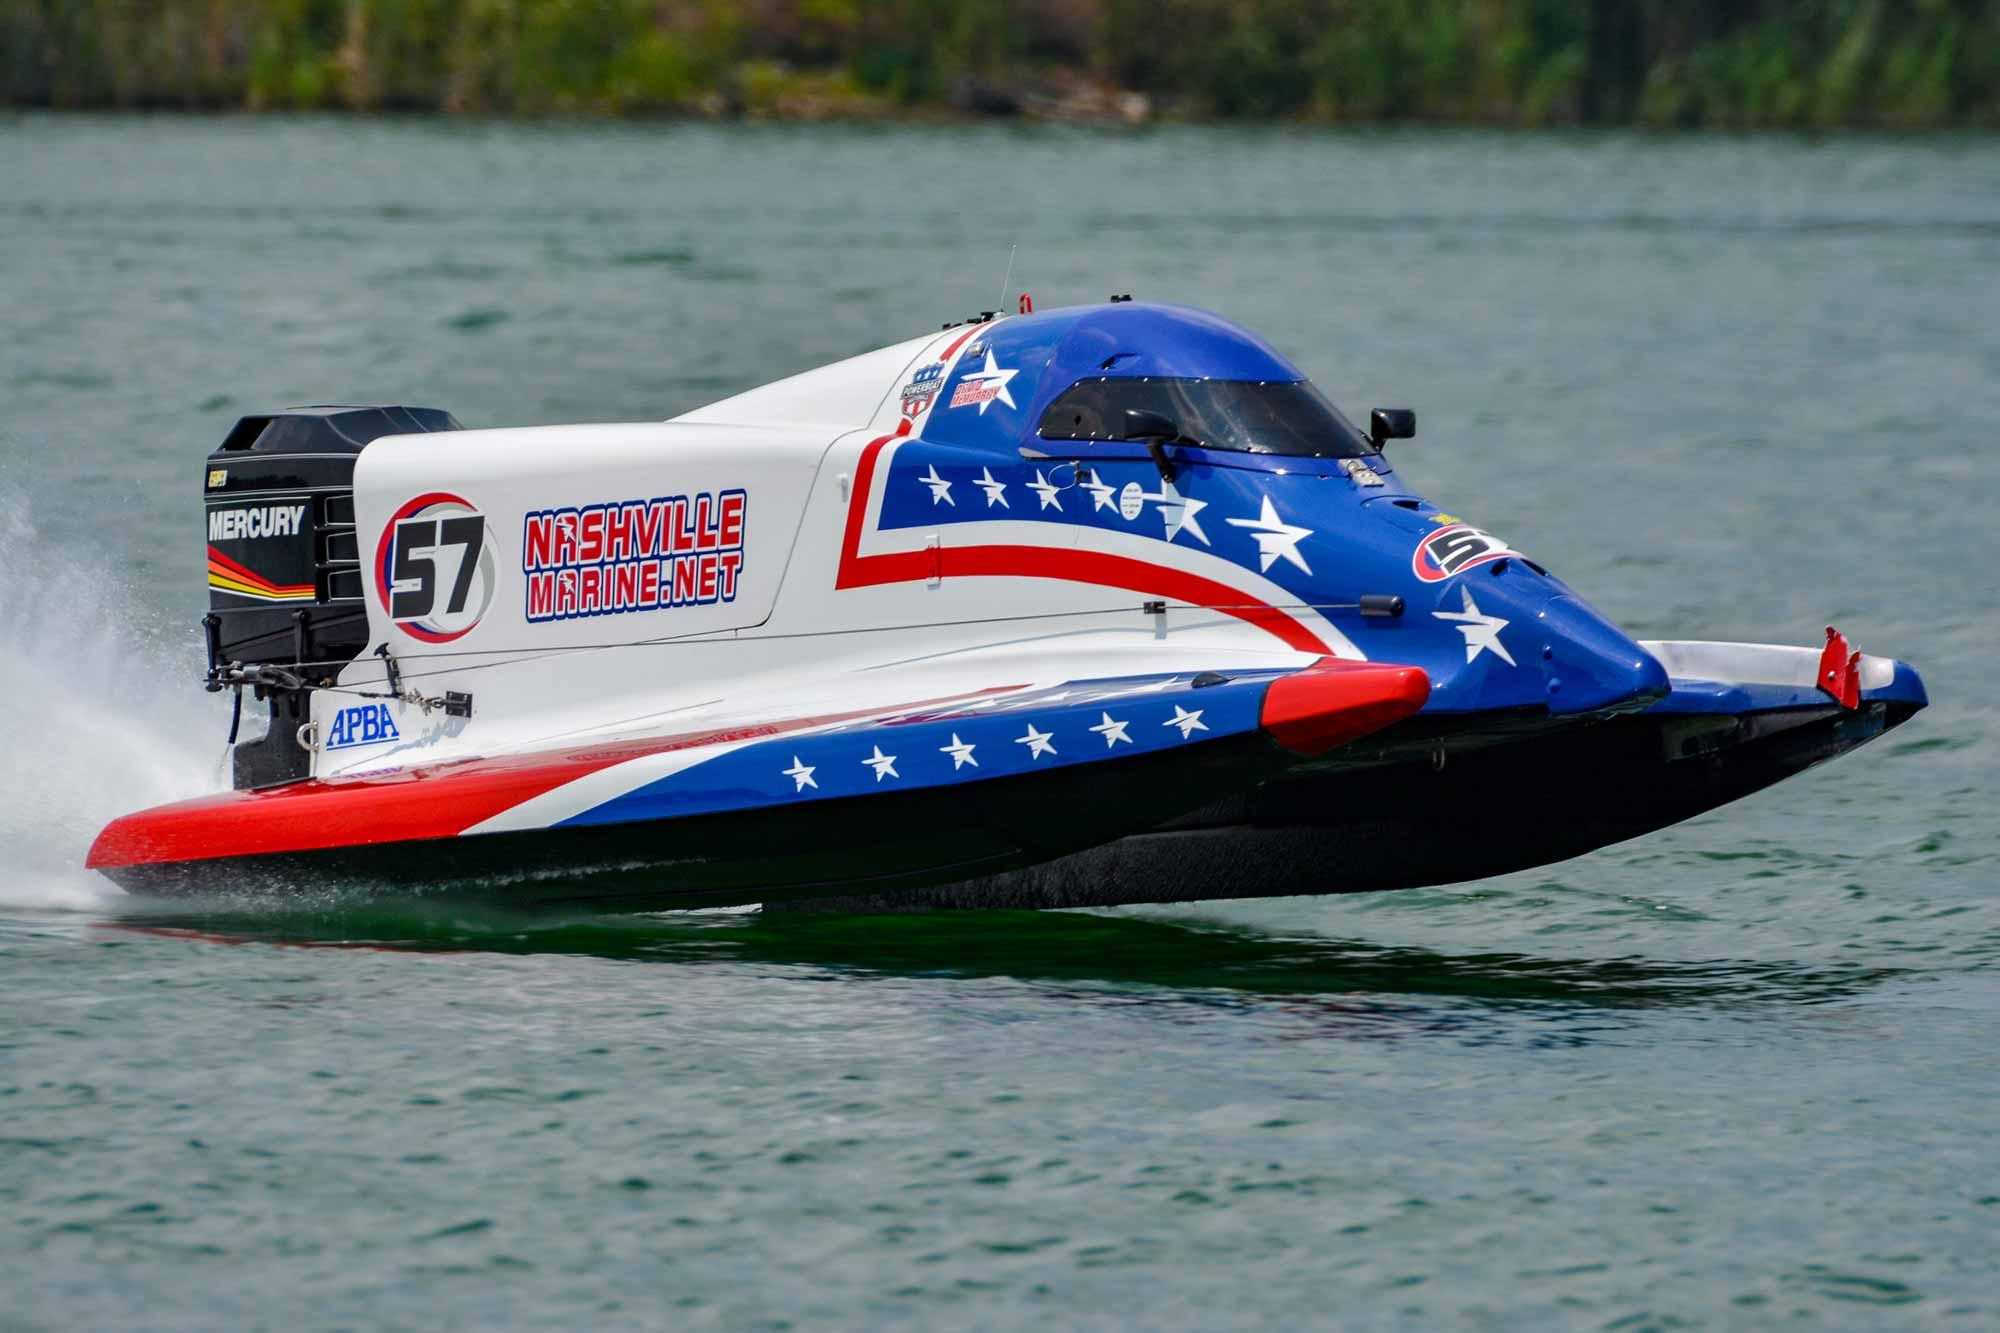 McMurray-Racing-Nashvill-Marine-2021-Springfield-F1-Race-12